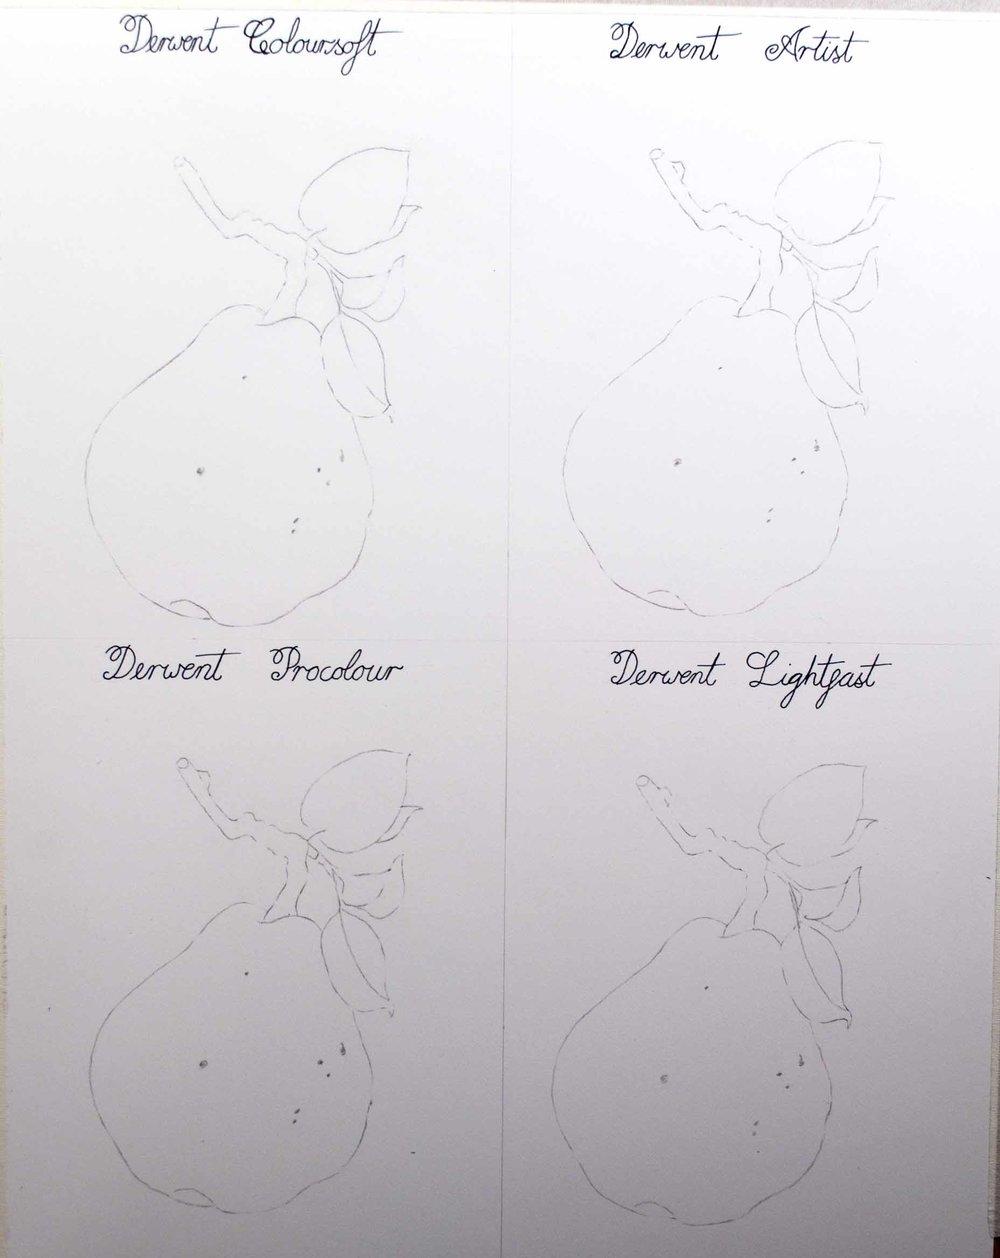 4 Botanical Images.jpg